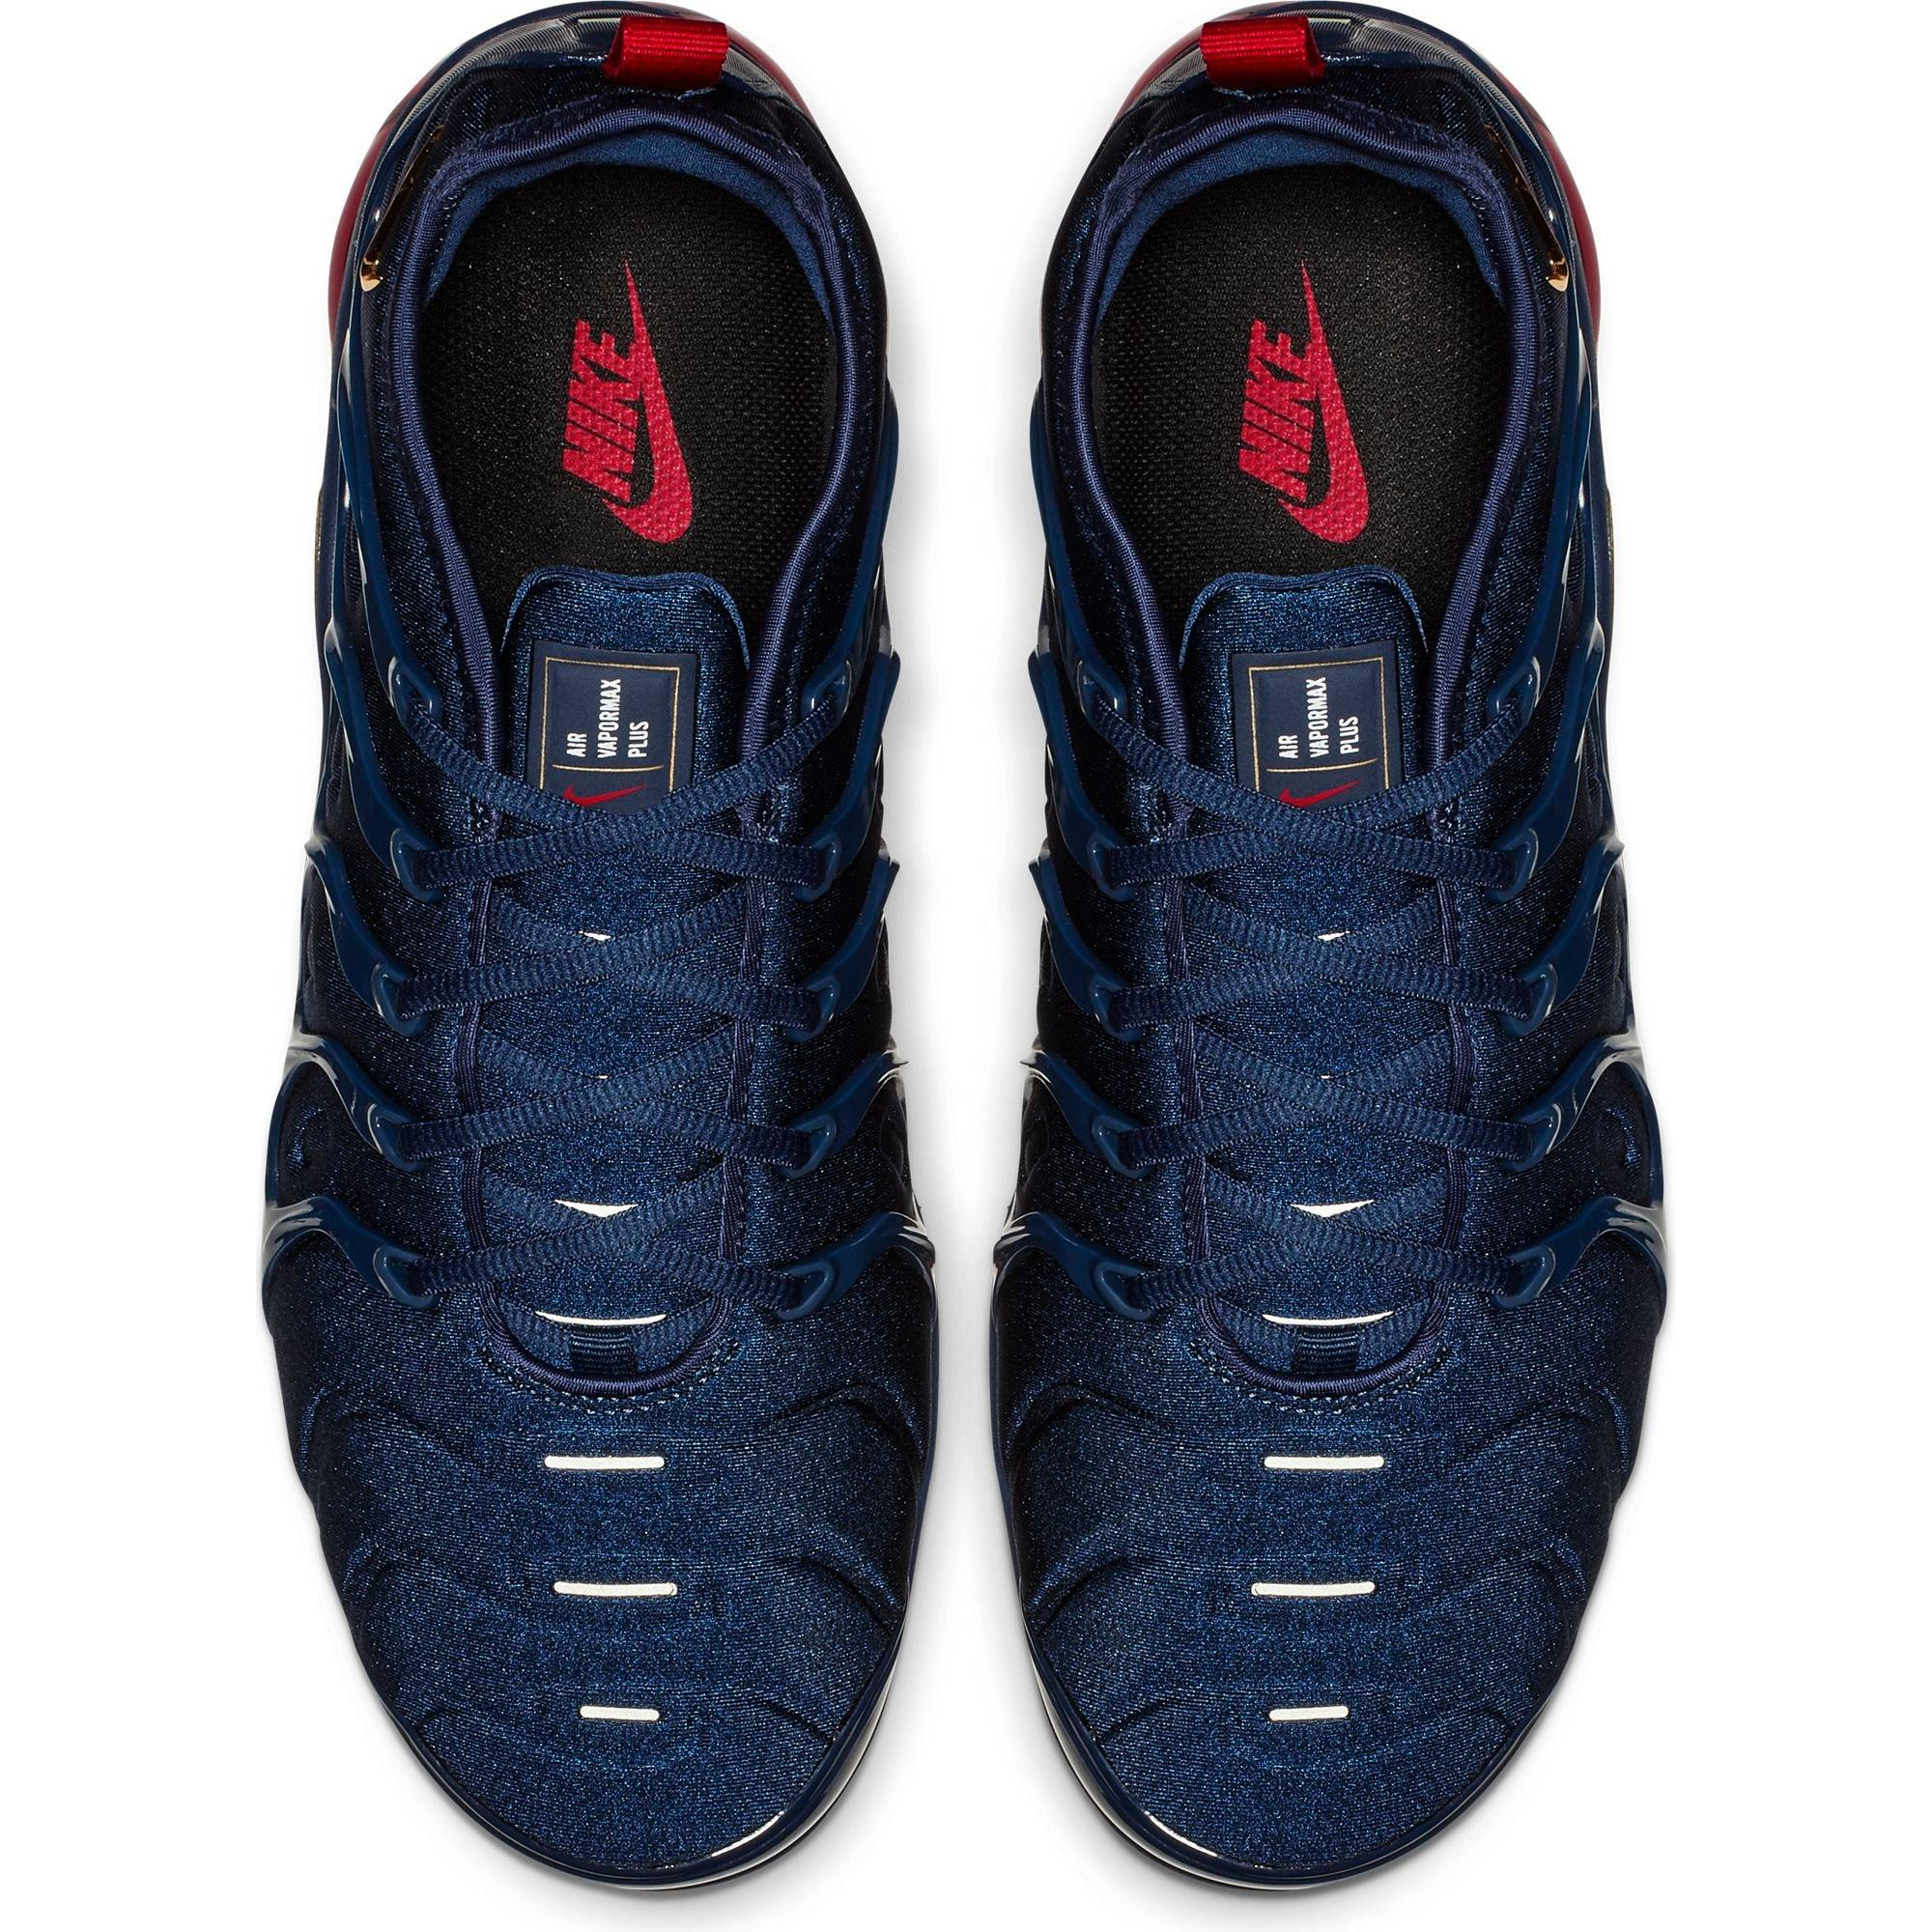 Sneakers Release- Nike VaporMax Plus